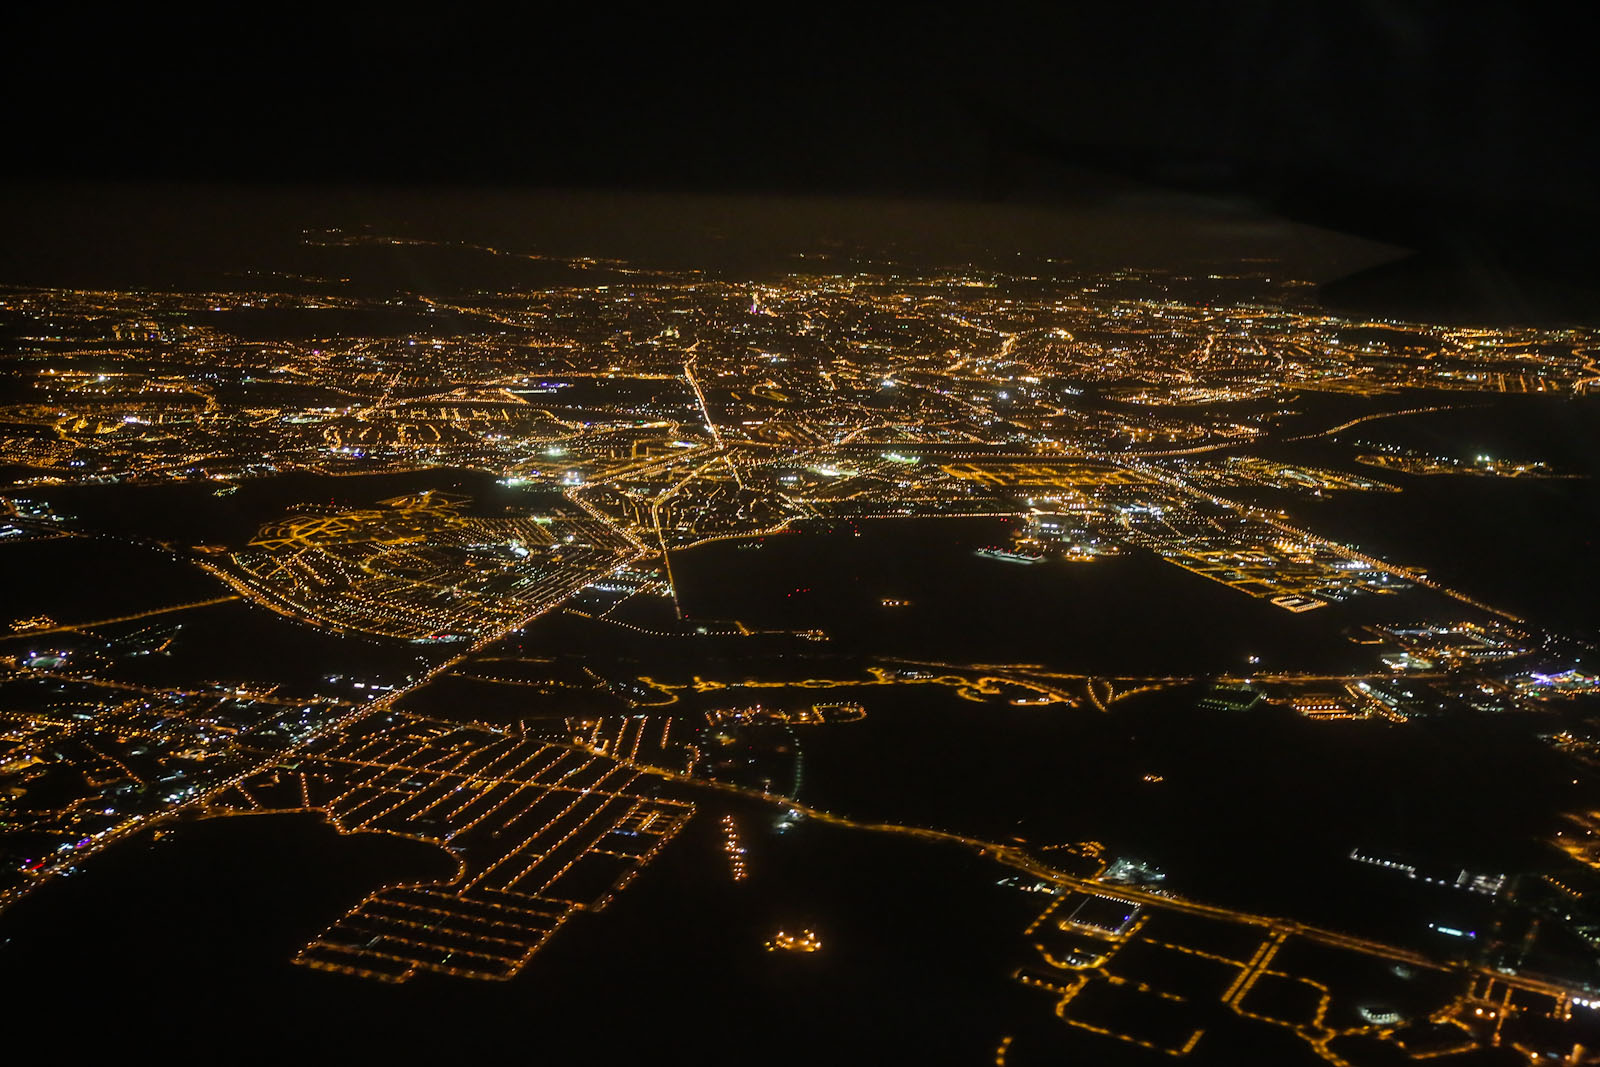 Вид на ночной Мадрид перед посадкой в аэропорту Барахас